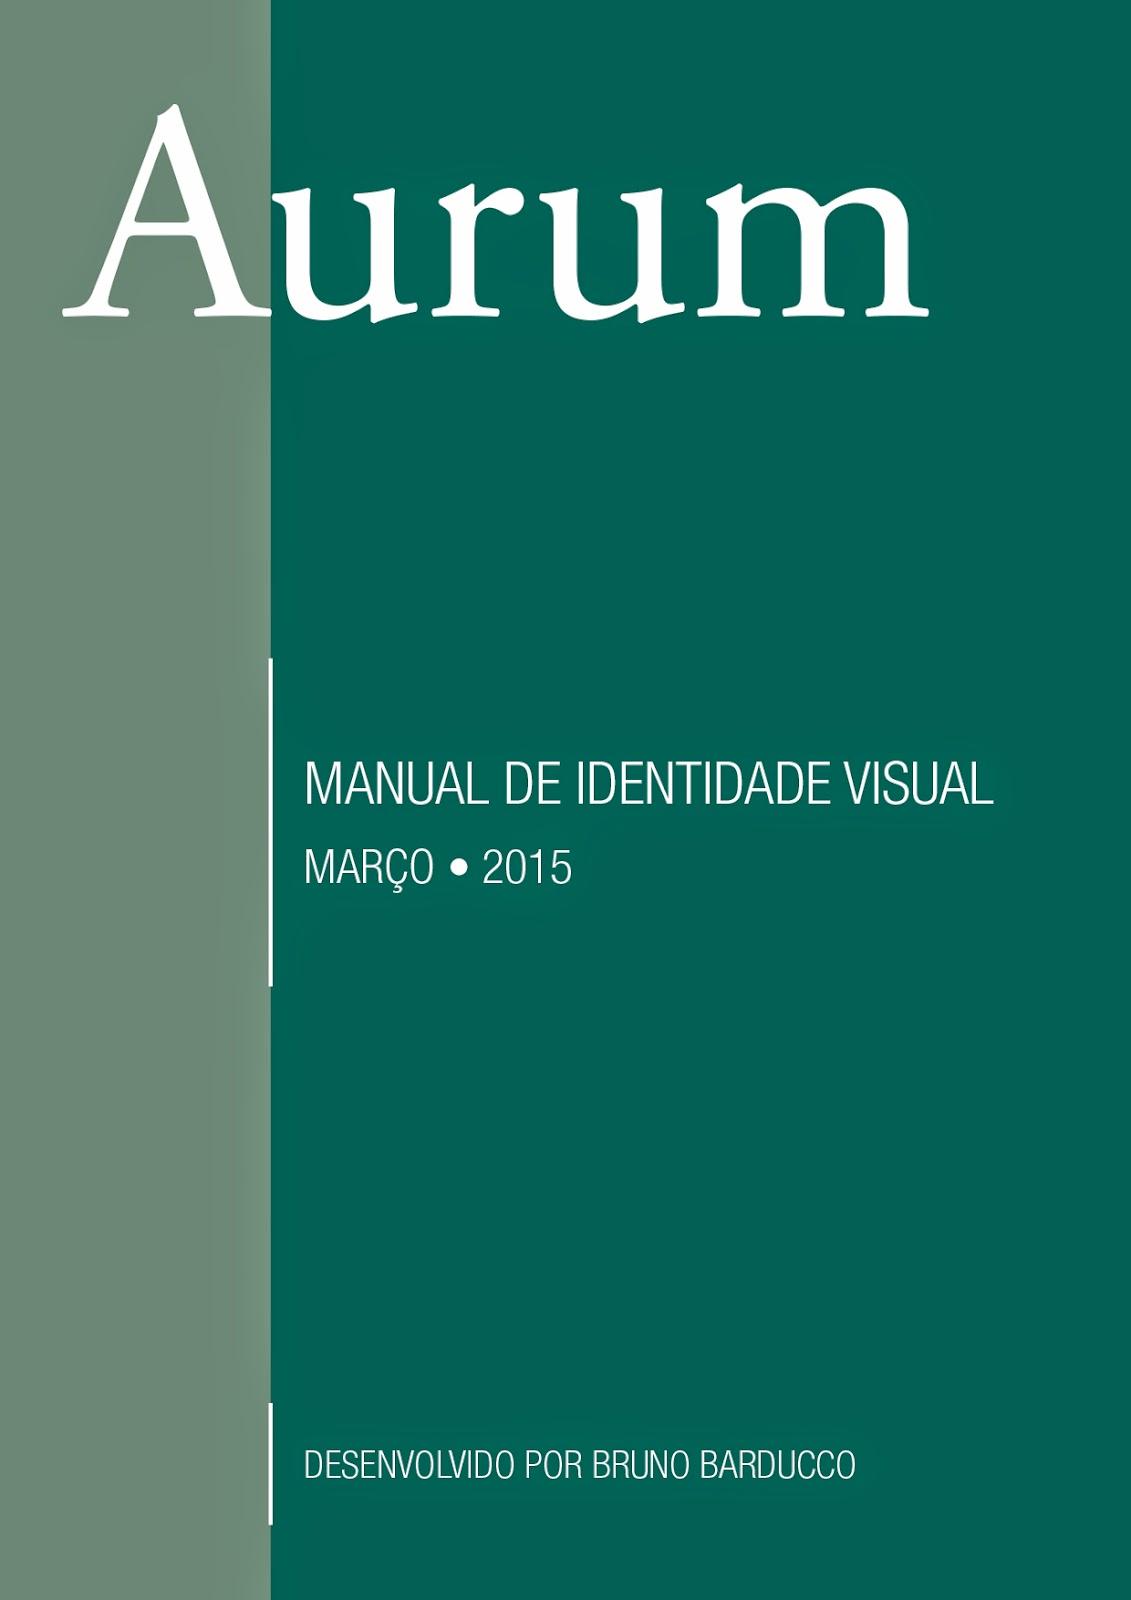 MANUAL_aurum-1